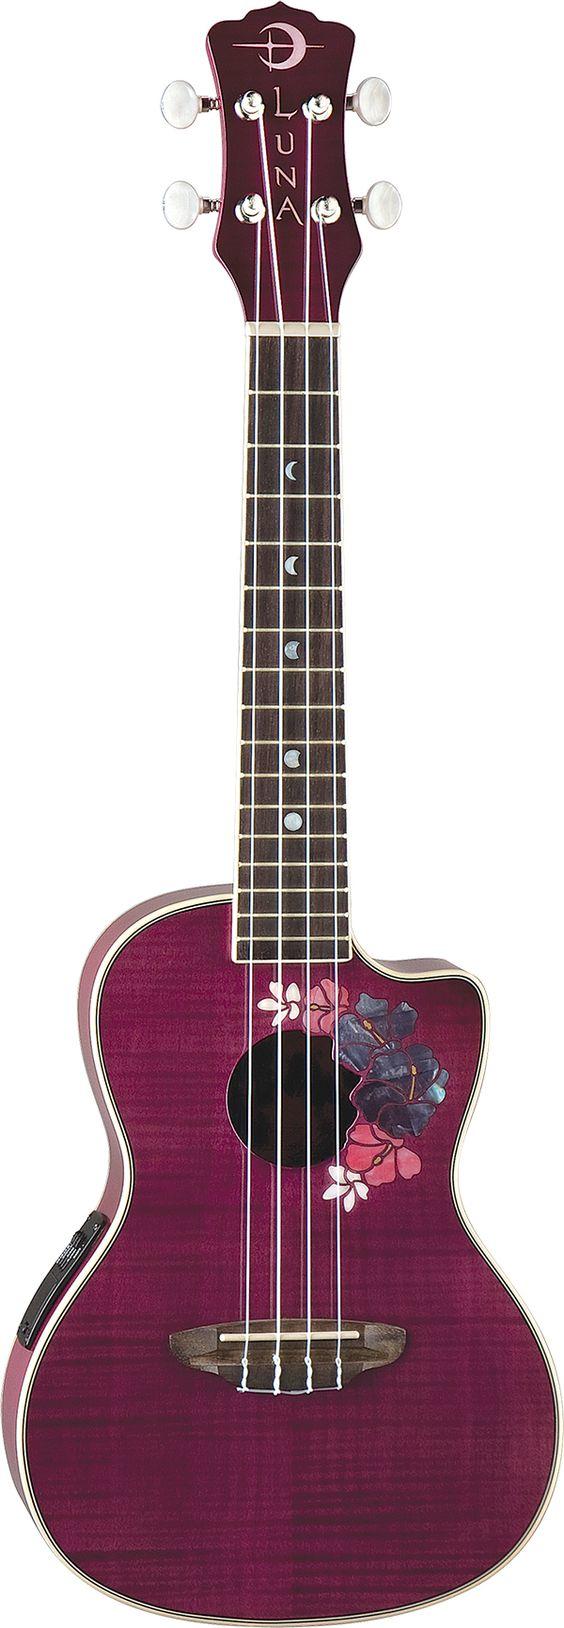 Luna Floral Uke For the Love of Luna Guitars... #lunapinandwin #lunatribe #lunaguitars